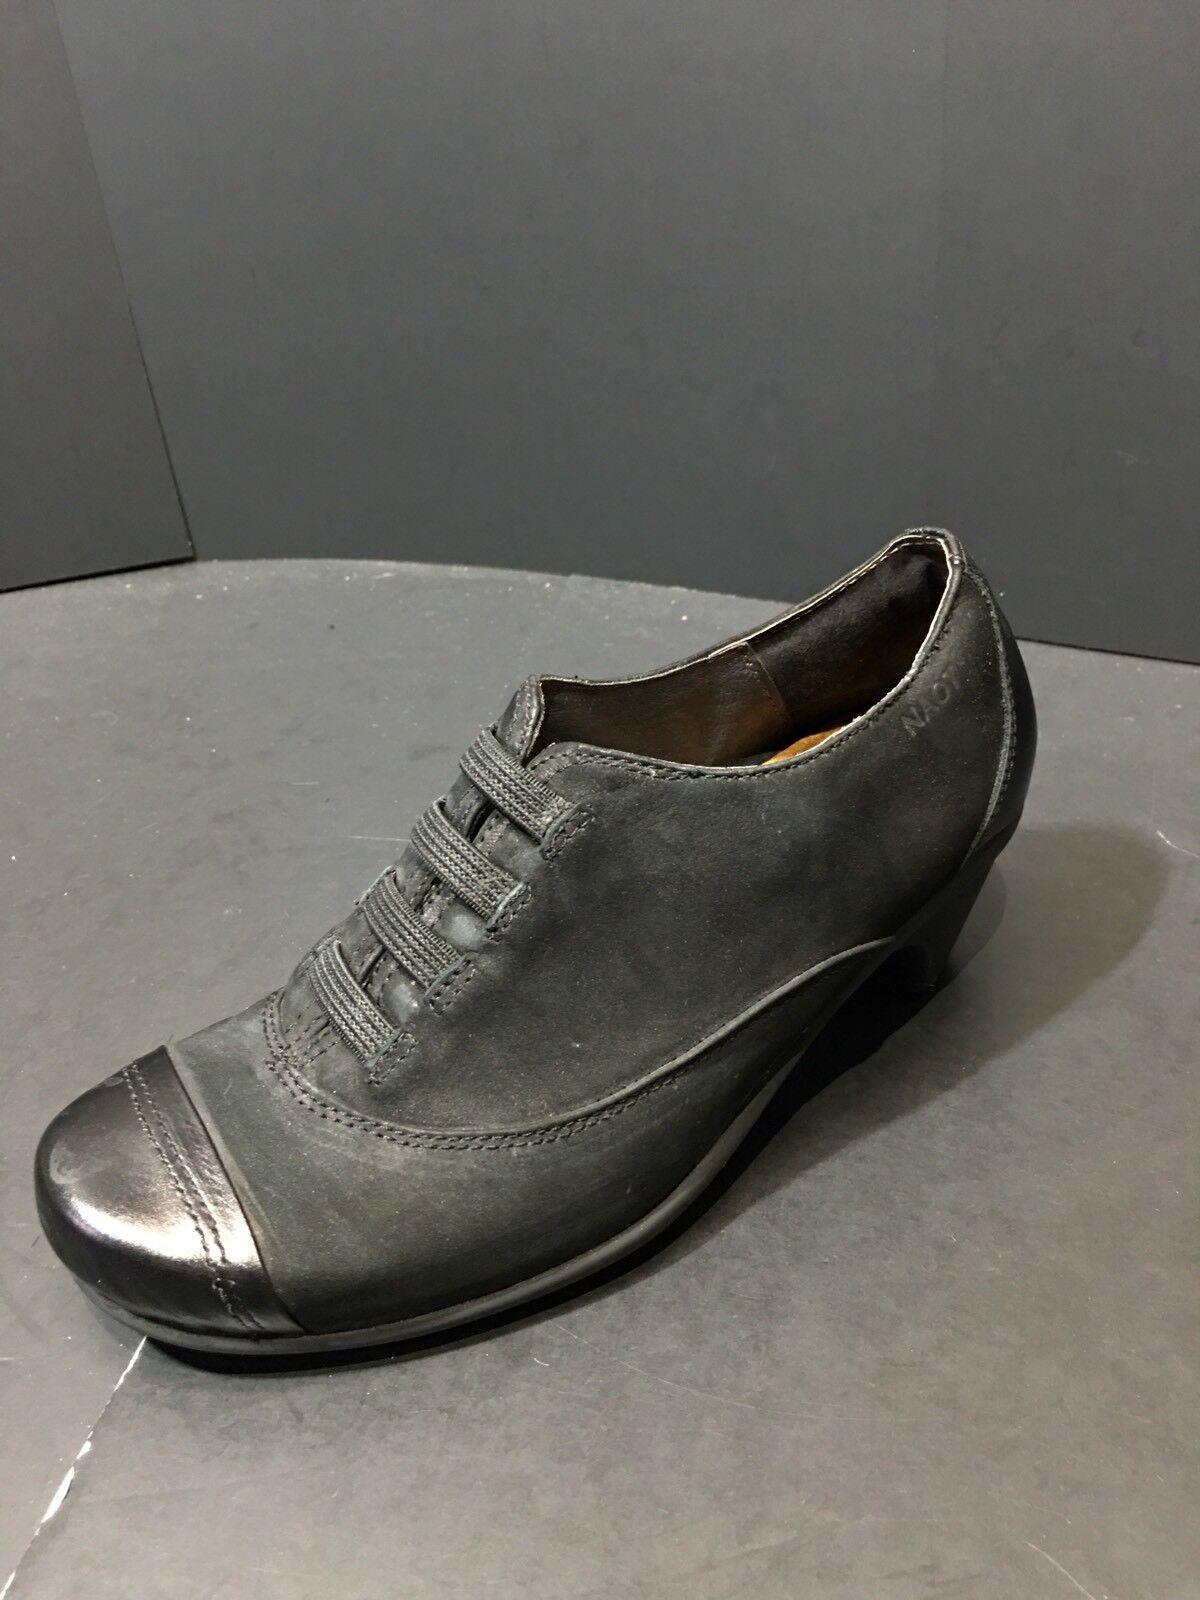 NAOT Royal Black Velvet Leather Capped Toe Oxford Heels Size EU 36